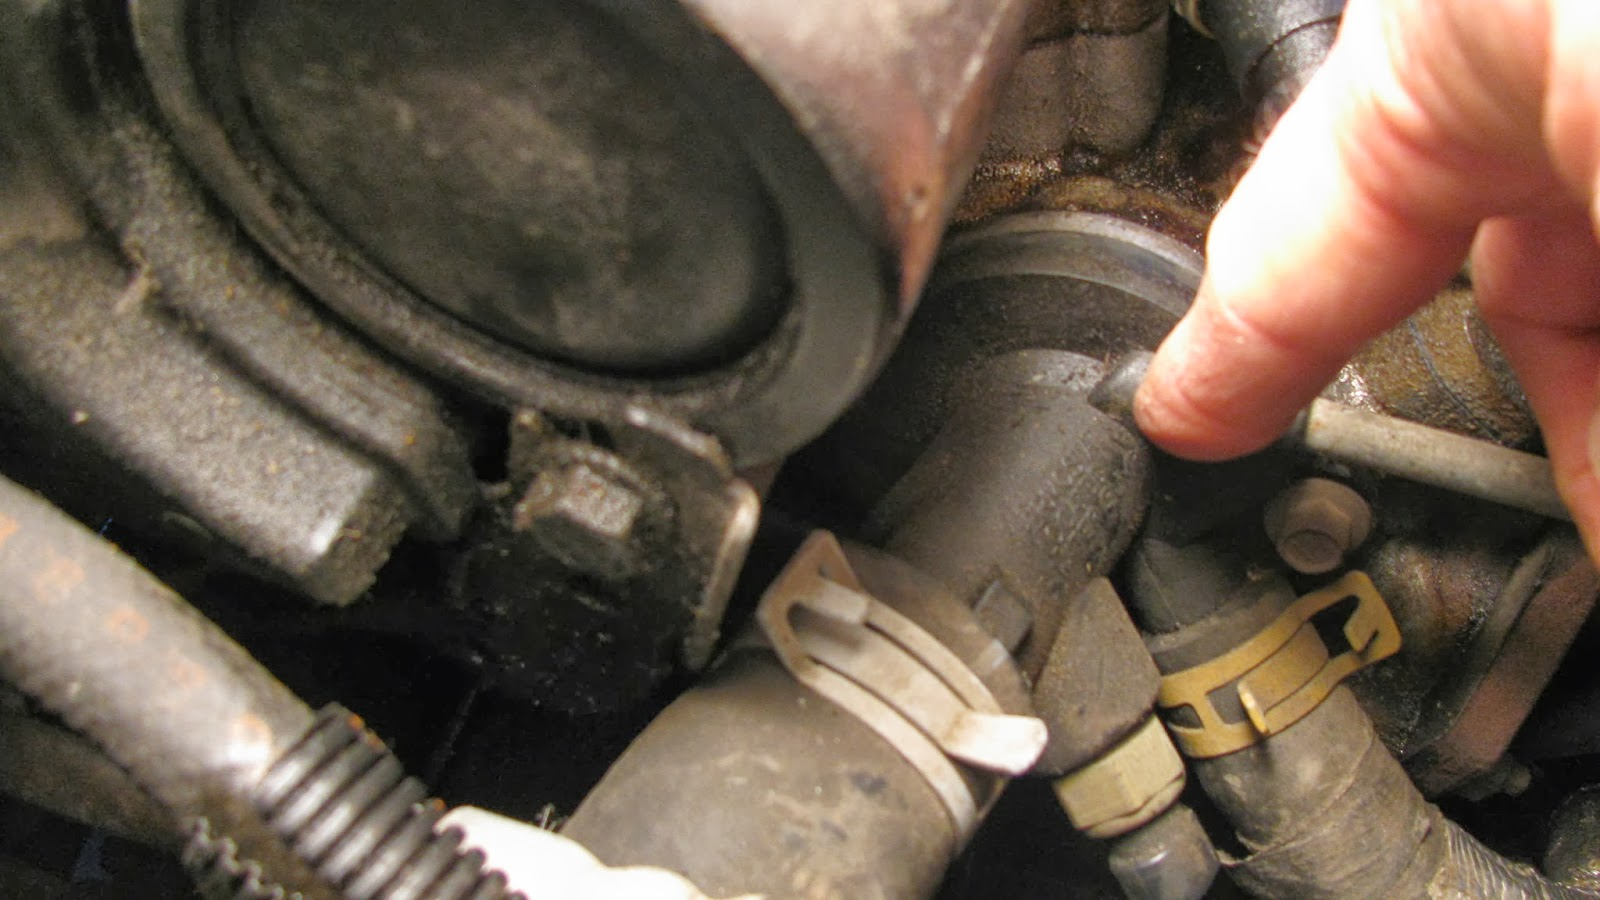 2002 Chevy Cavalier Car Stereo Wiring Diagram Hopkins Trailer Plug For 2000 Pontiac Grand Am Toyota Corolla ...